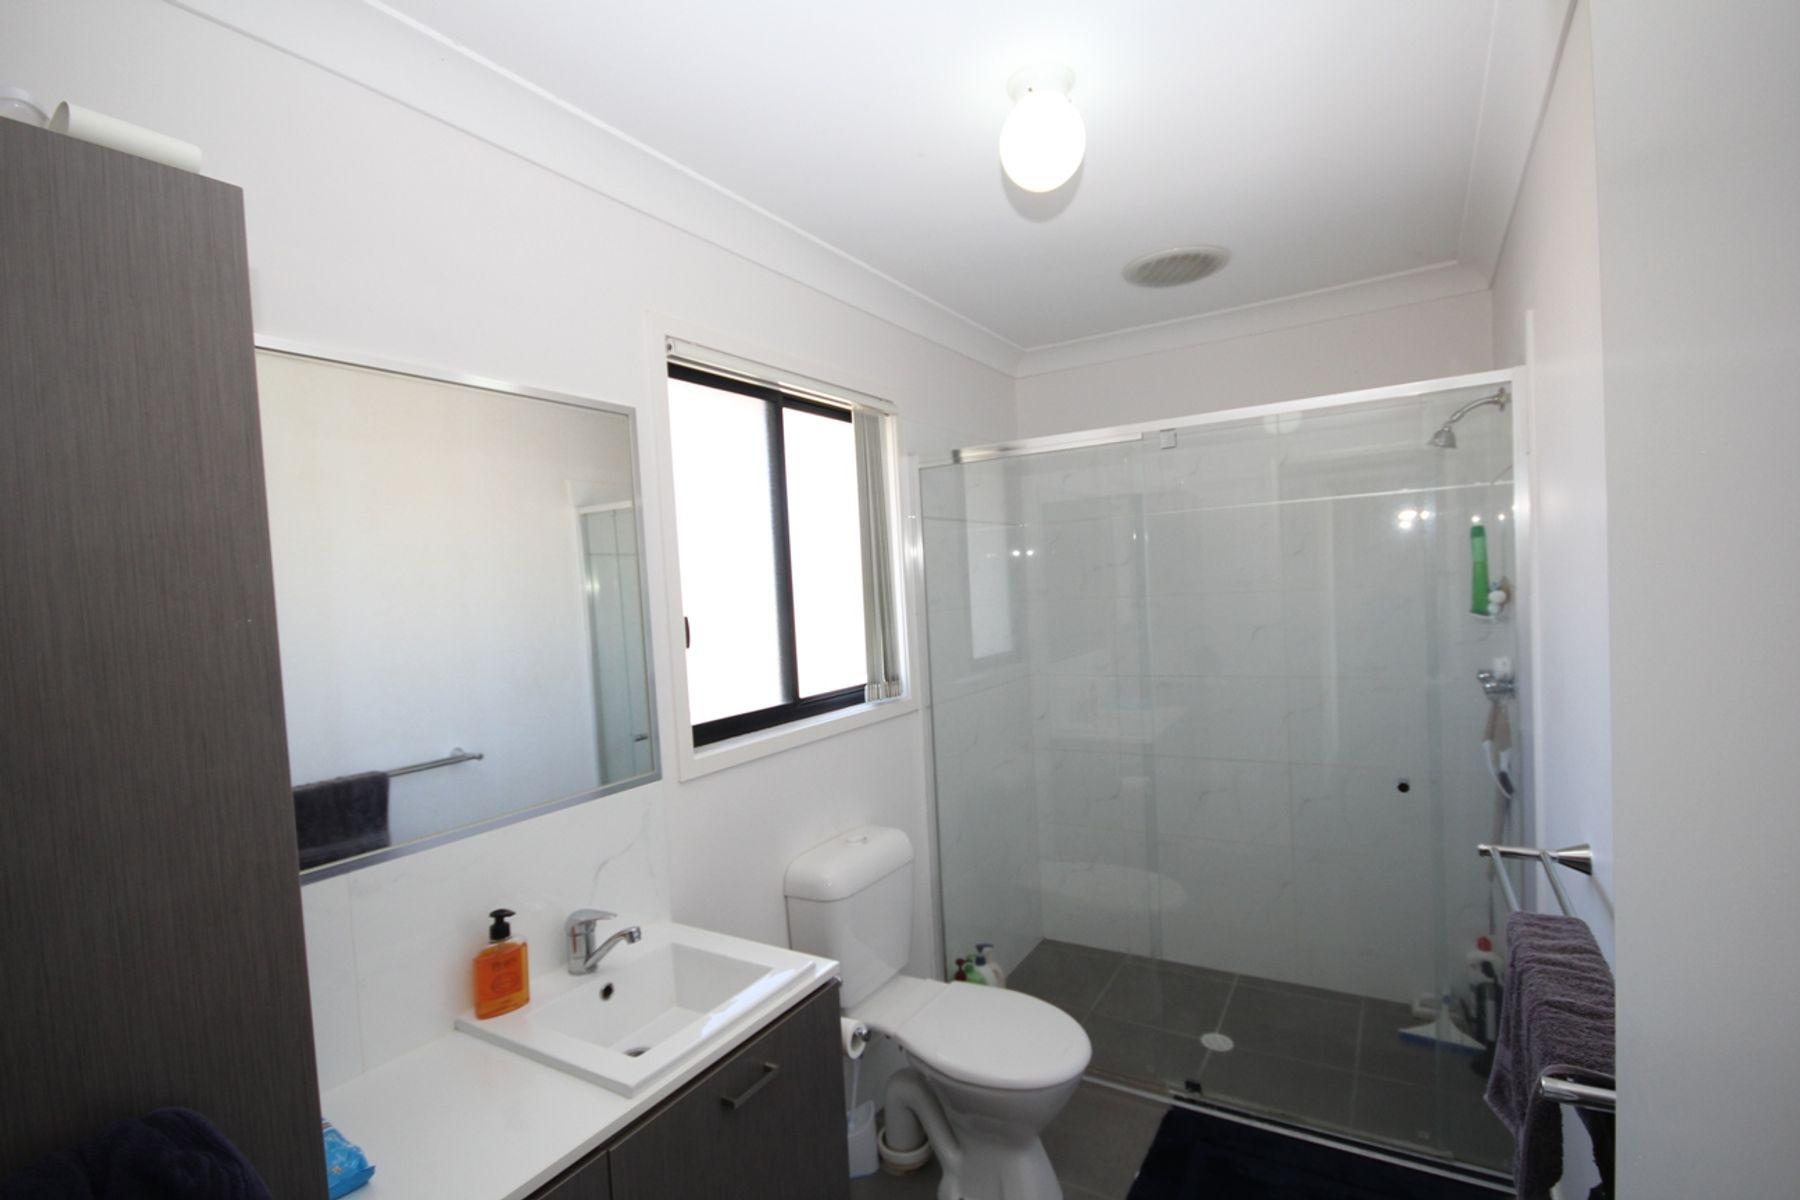 79/20 Sanflex Street, Darra, QLD 4076